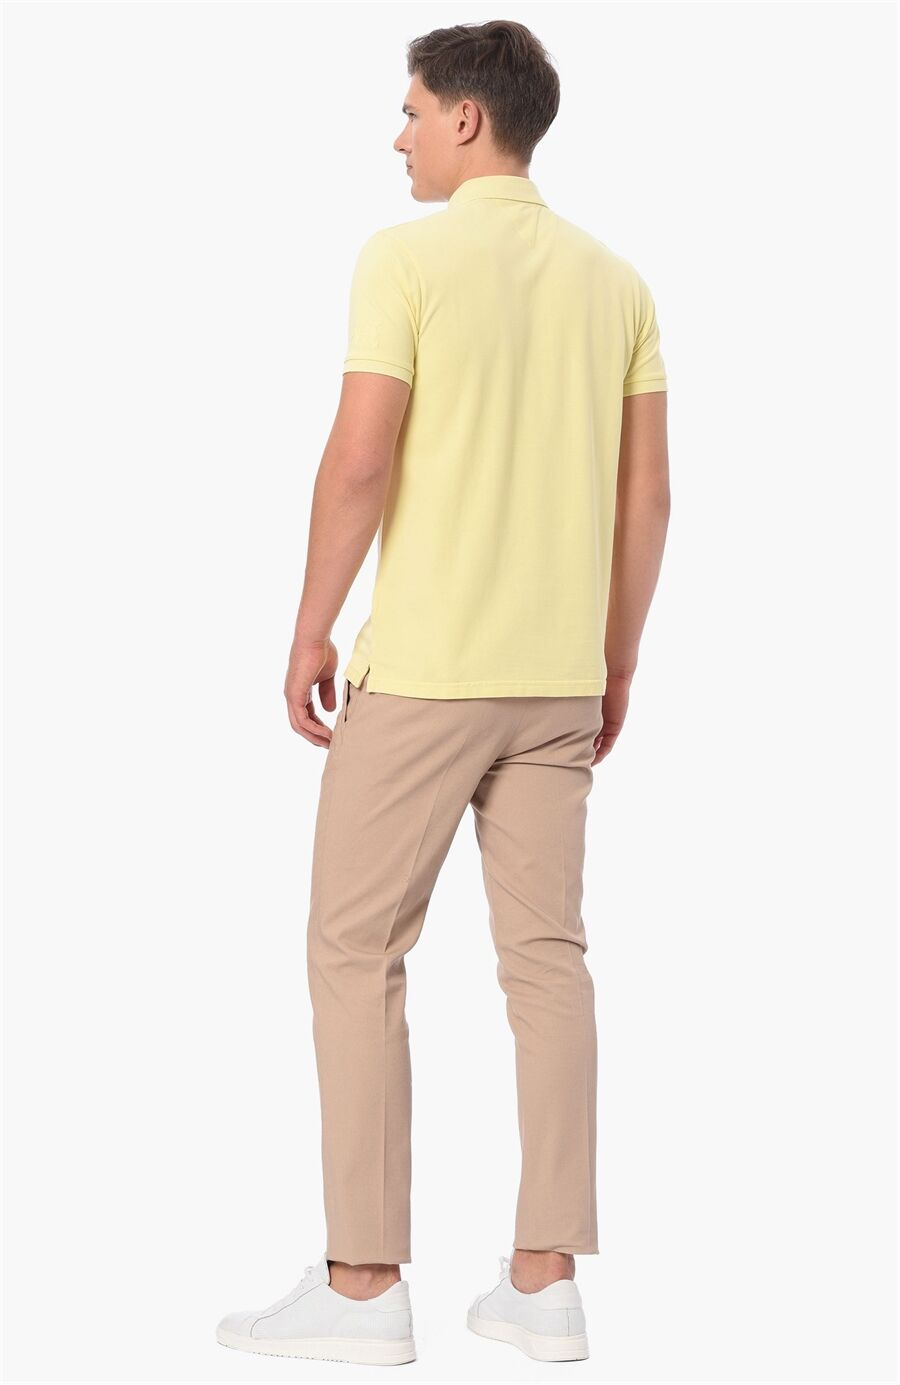 Polo Yaka Slım Fit Sarı Tshirt